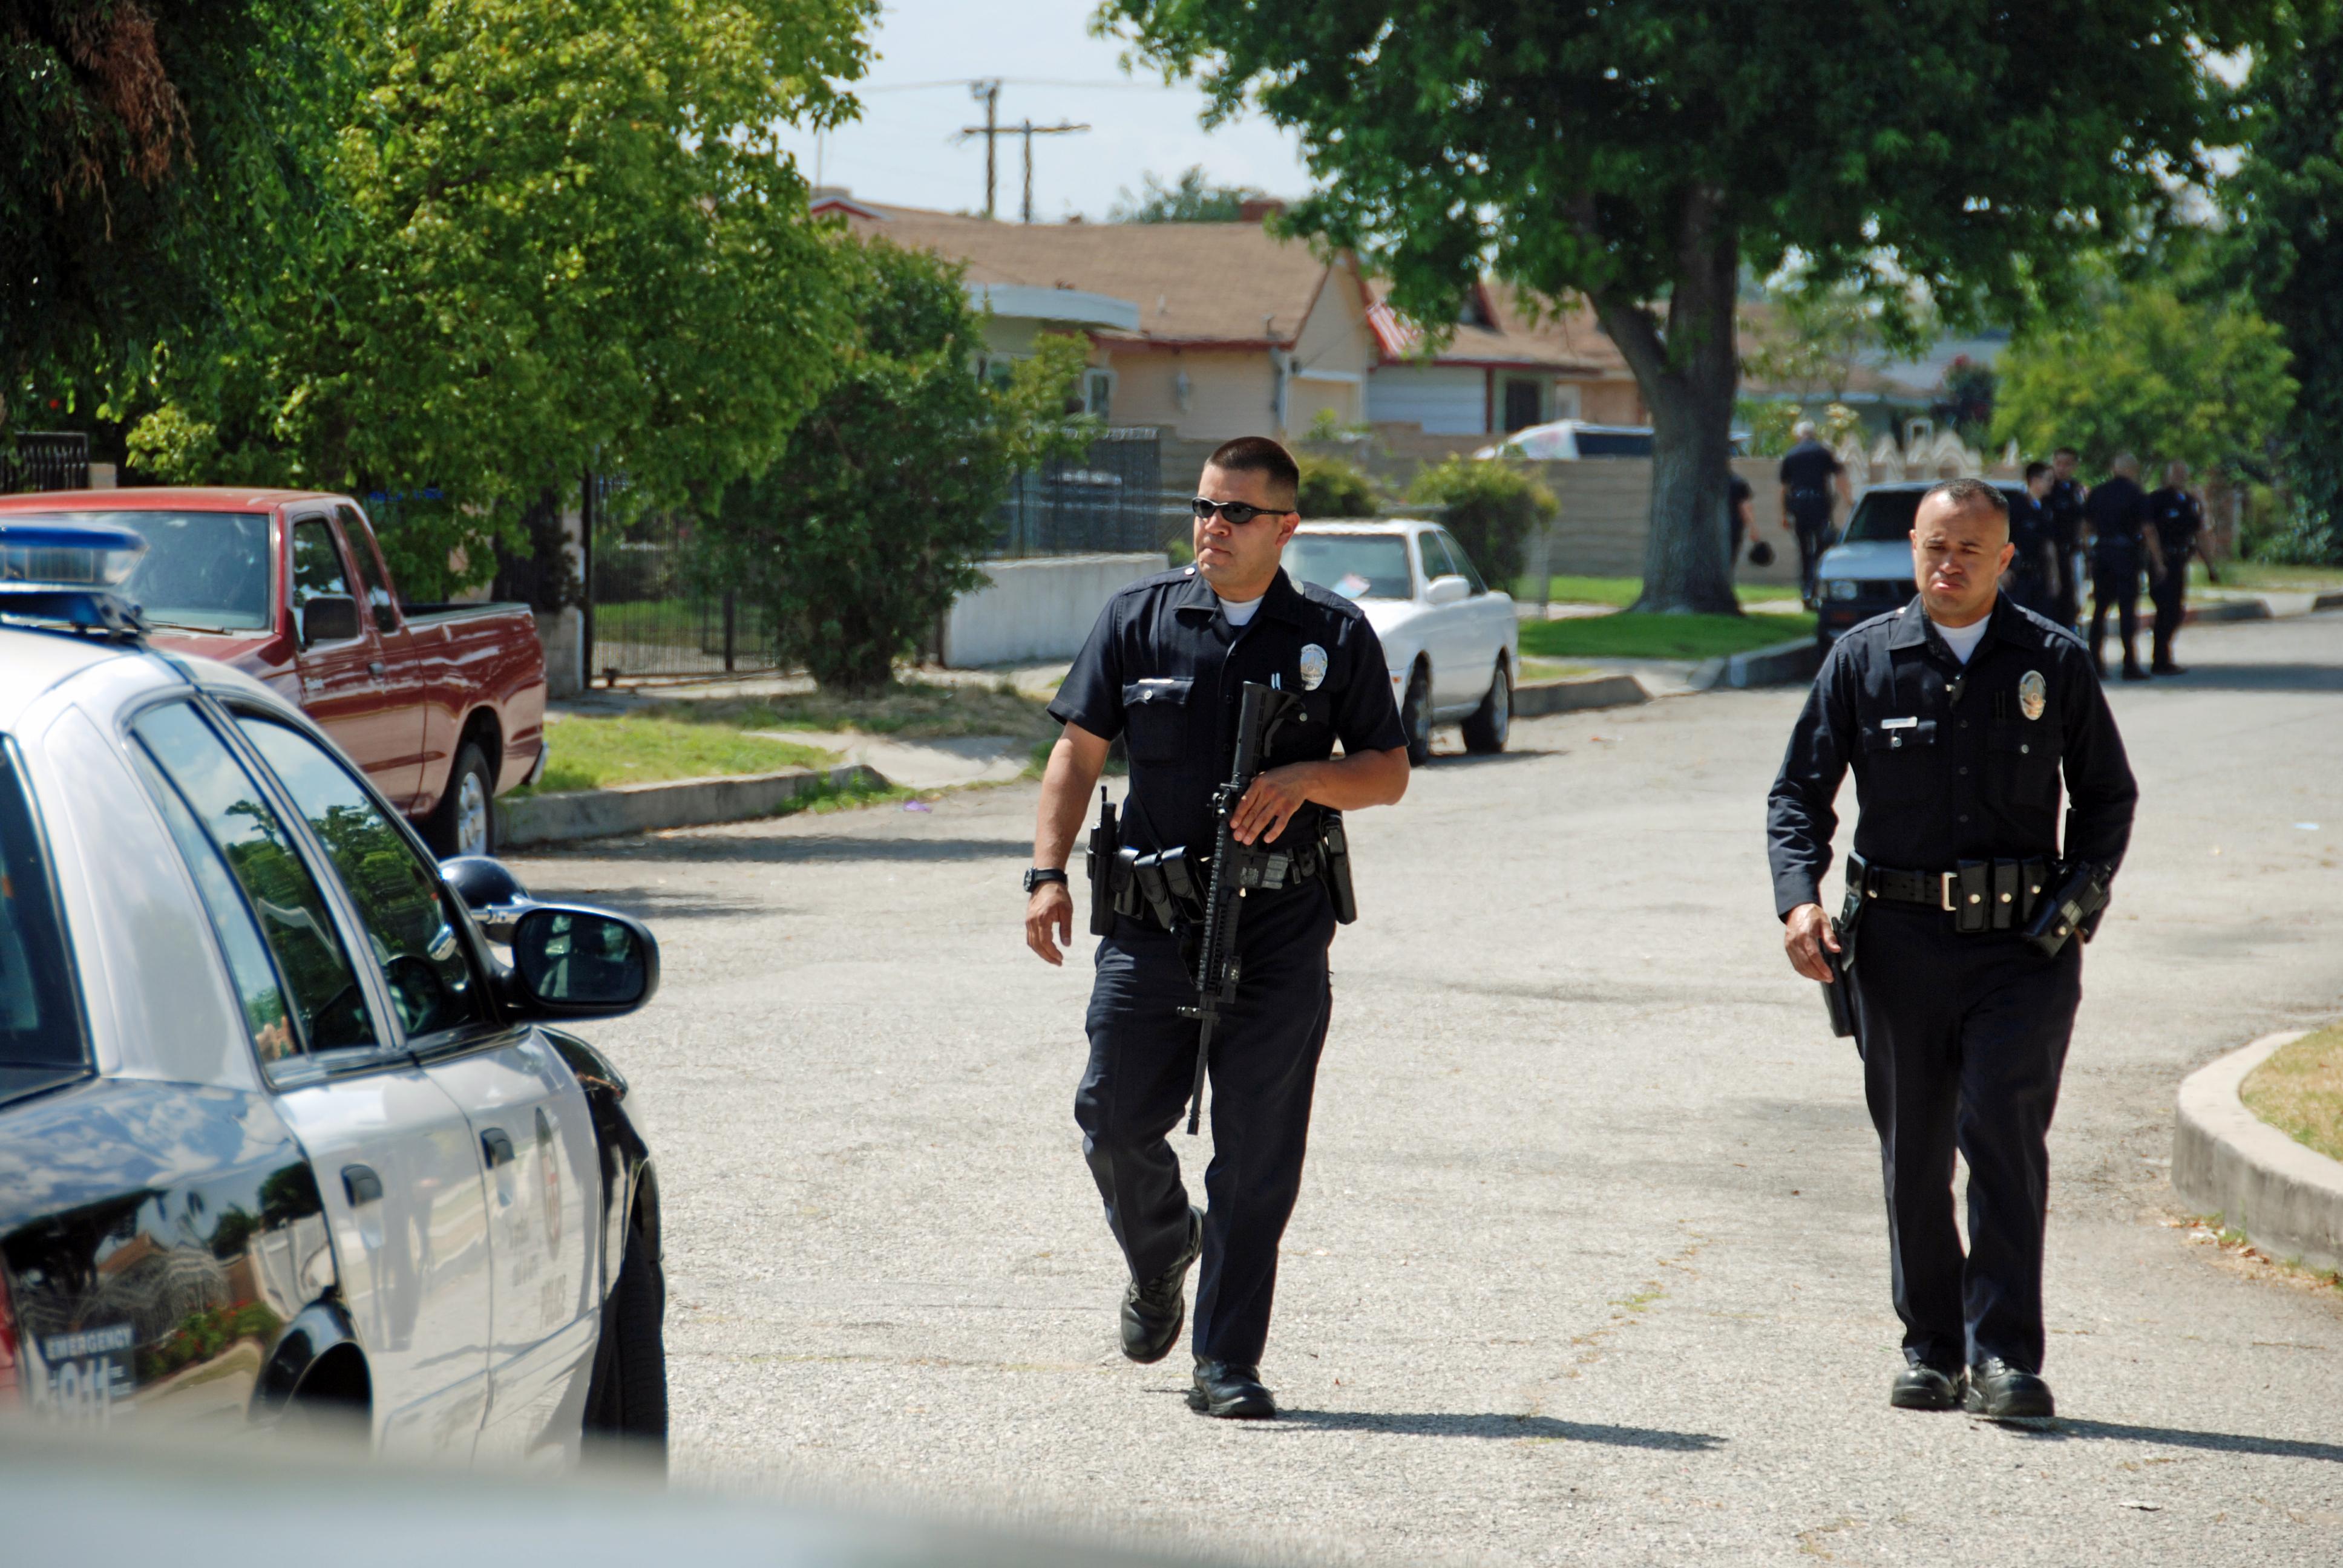 lapd police uniforms - photo #37